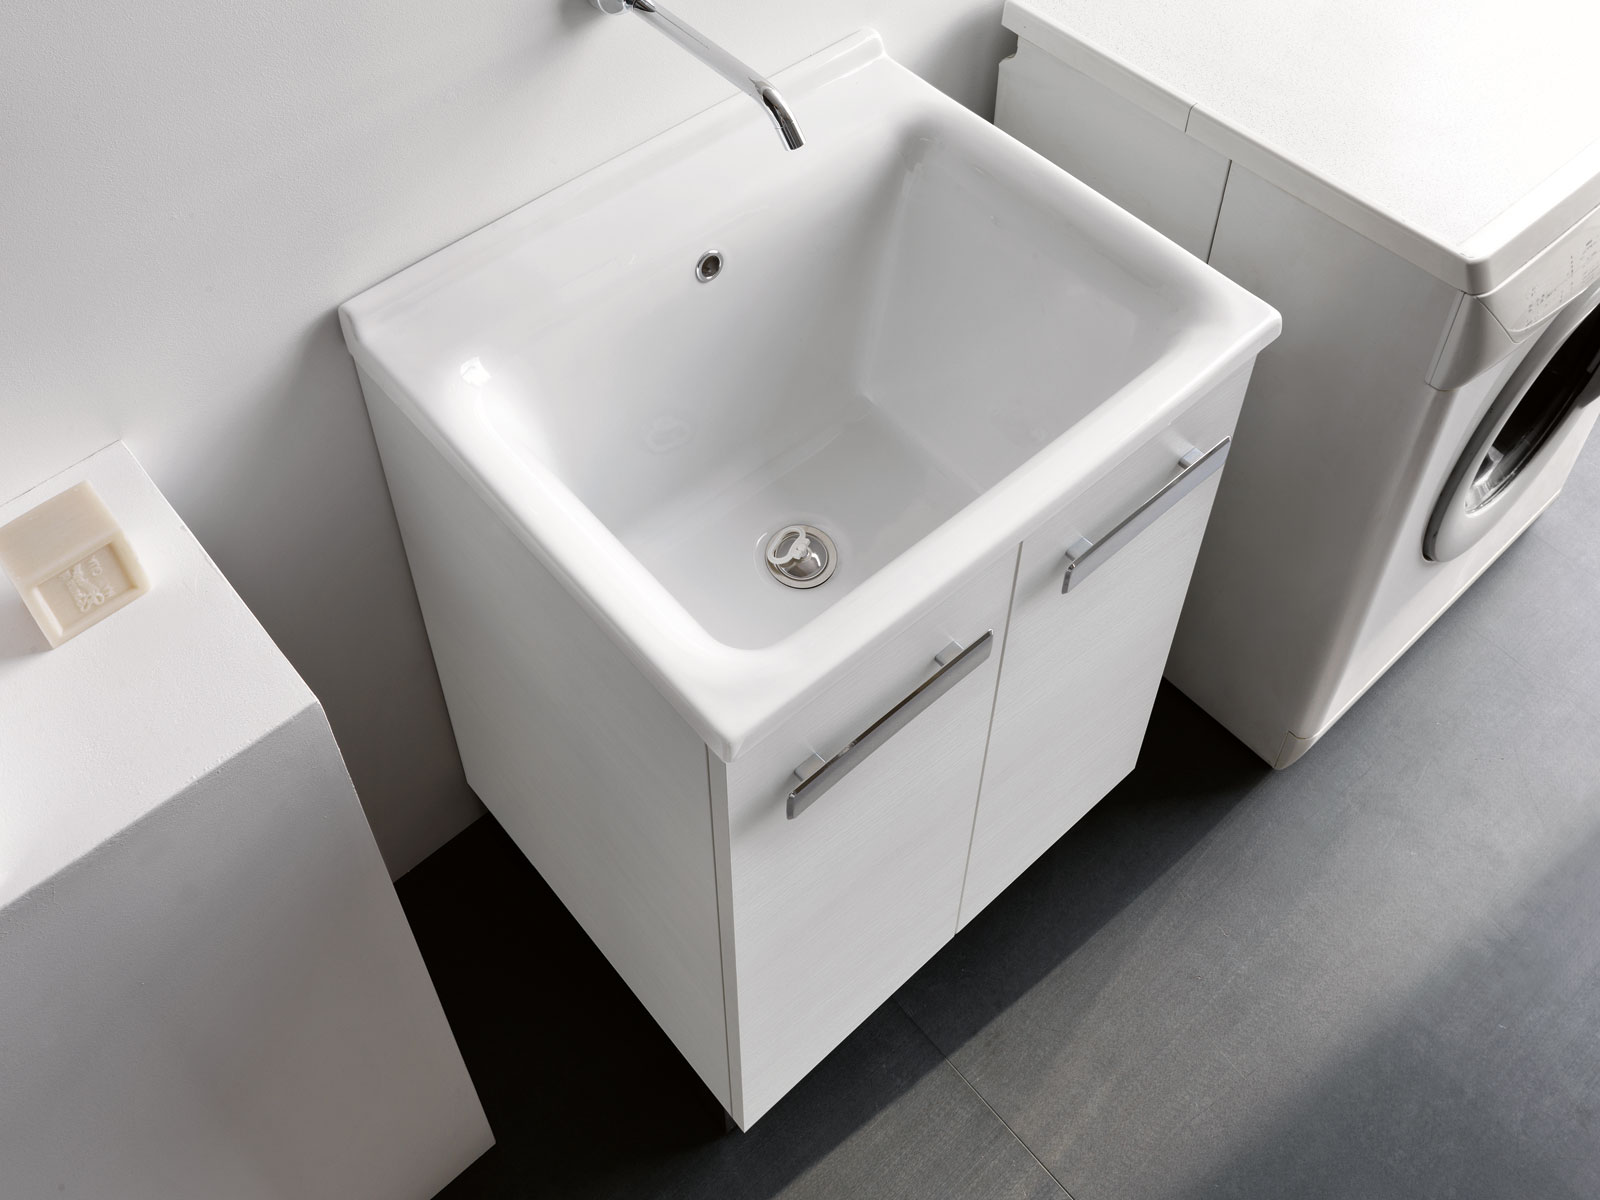 Offerte Lavatoio Per Lavanderia.Mobili Lavelli Lavatoio Per Lavanderia In Ceramica